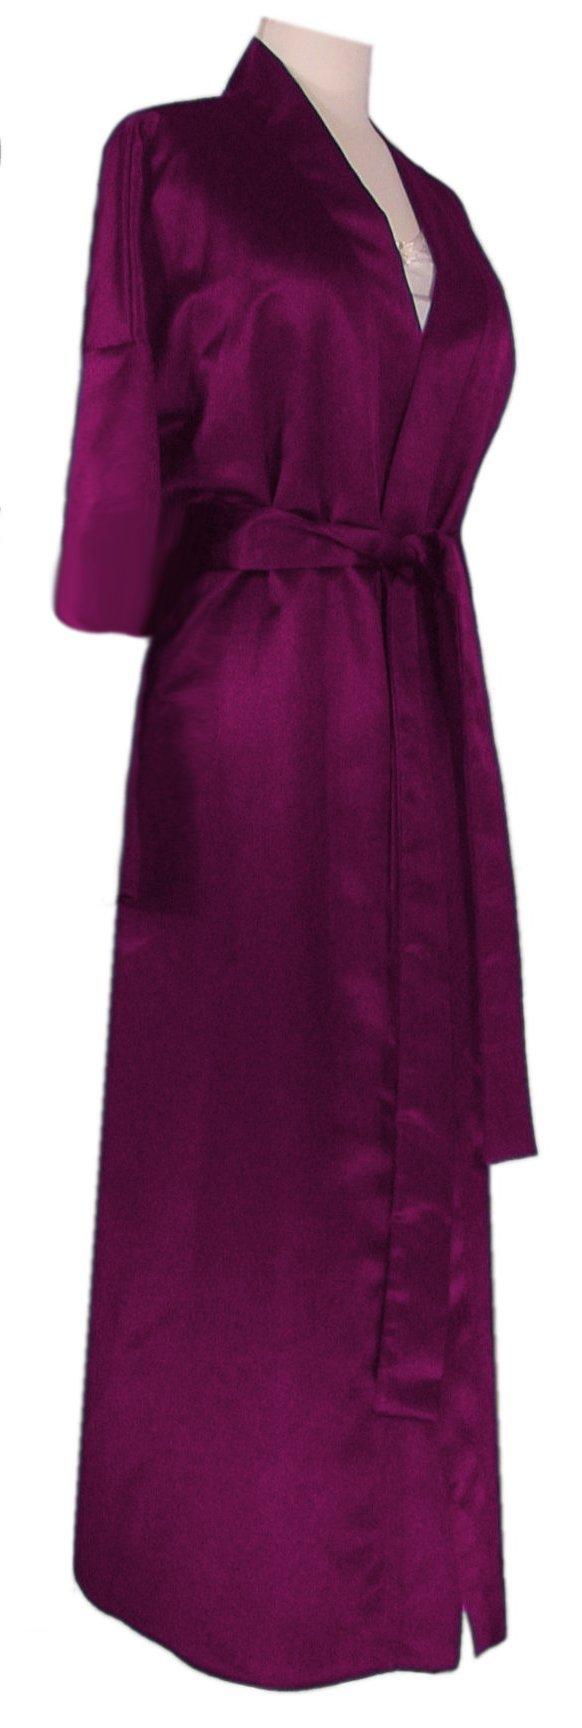 b0a2d4ba37 SALE! Plus Size Cotton or Satin Robes - Beautiful Lightweight Satin ...